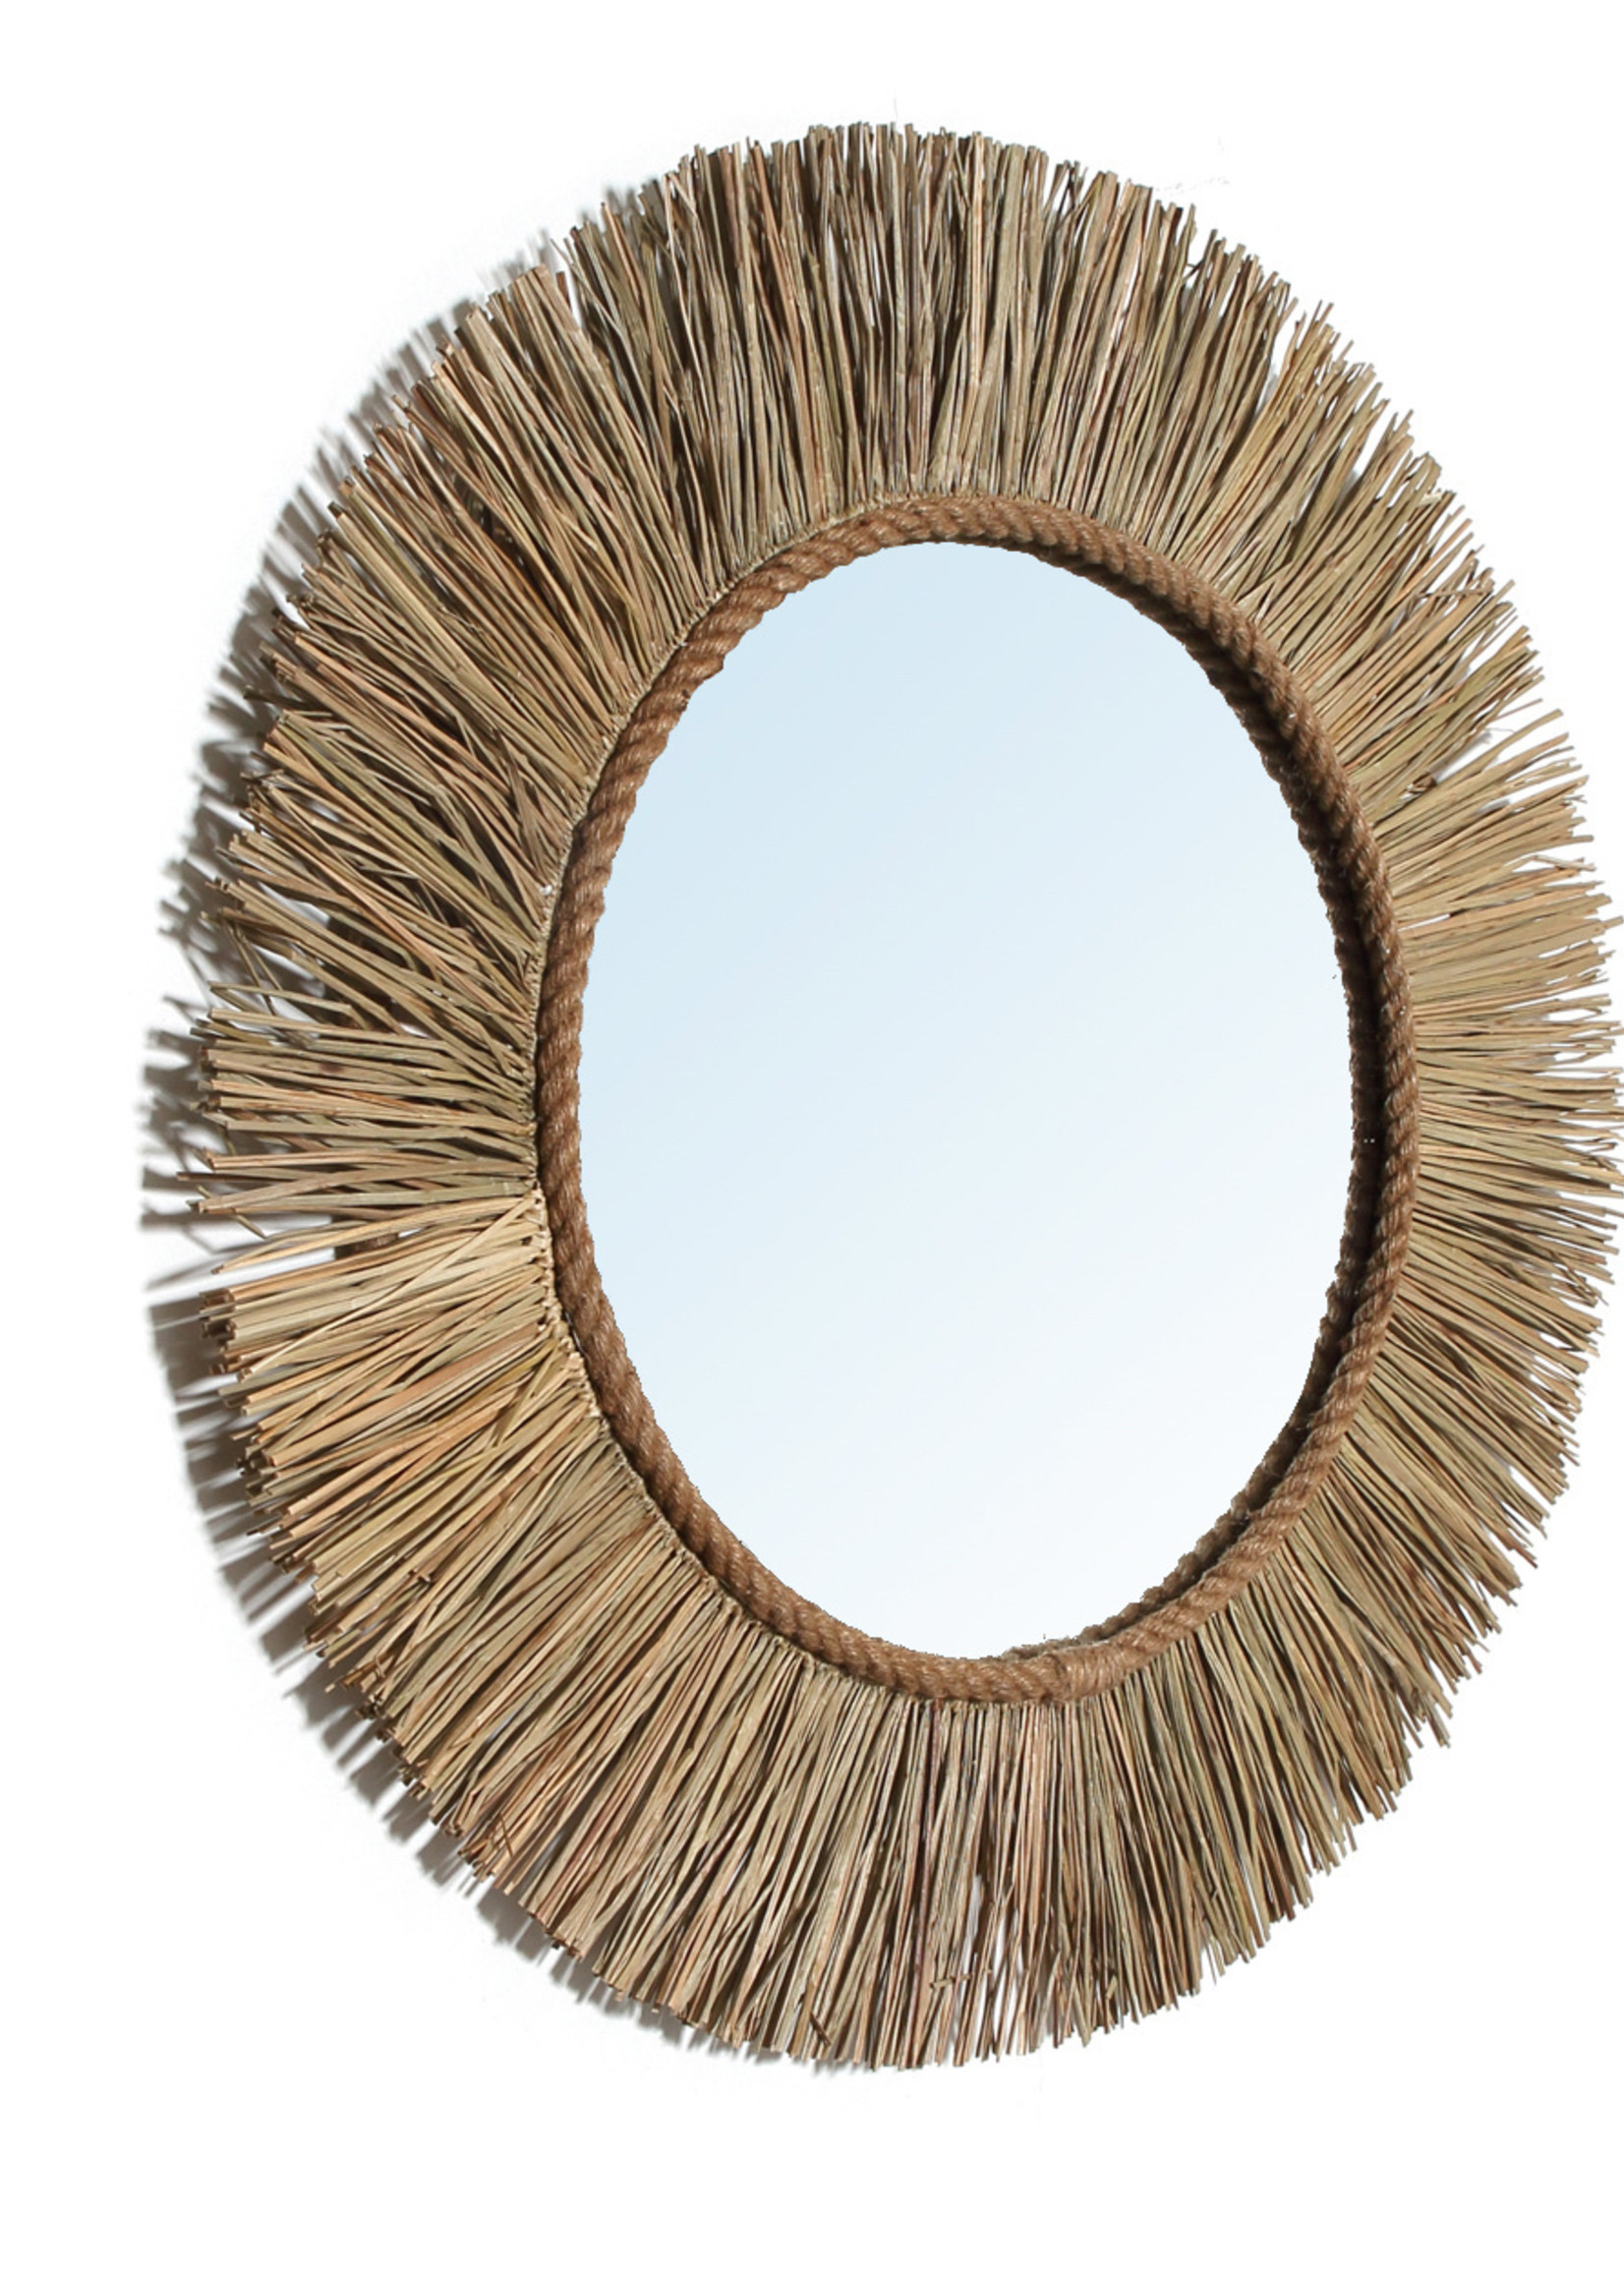 The St Barth Mirror